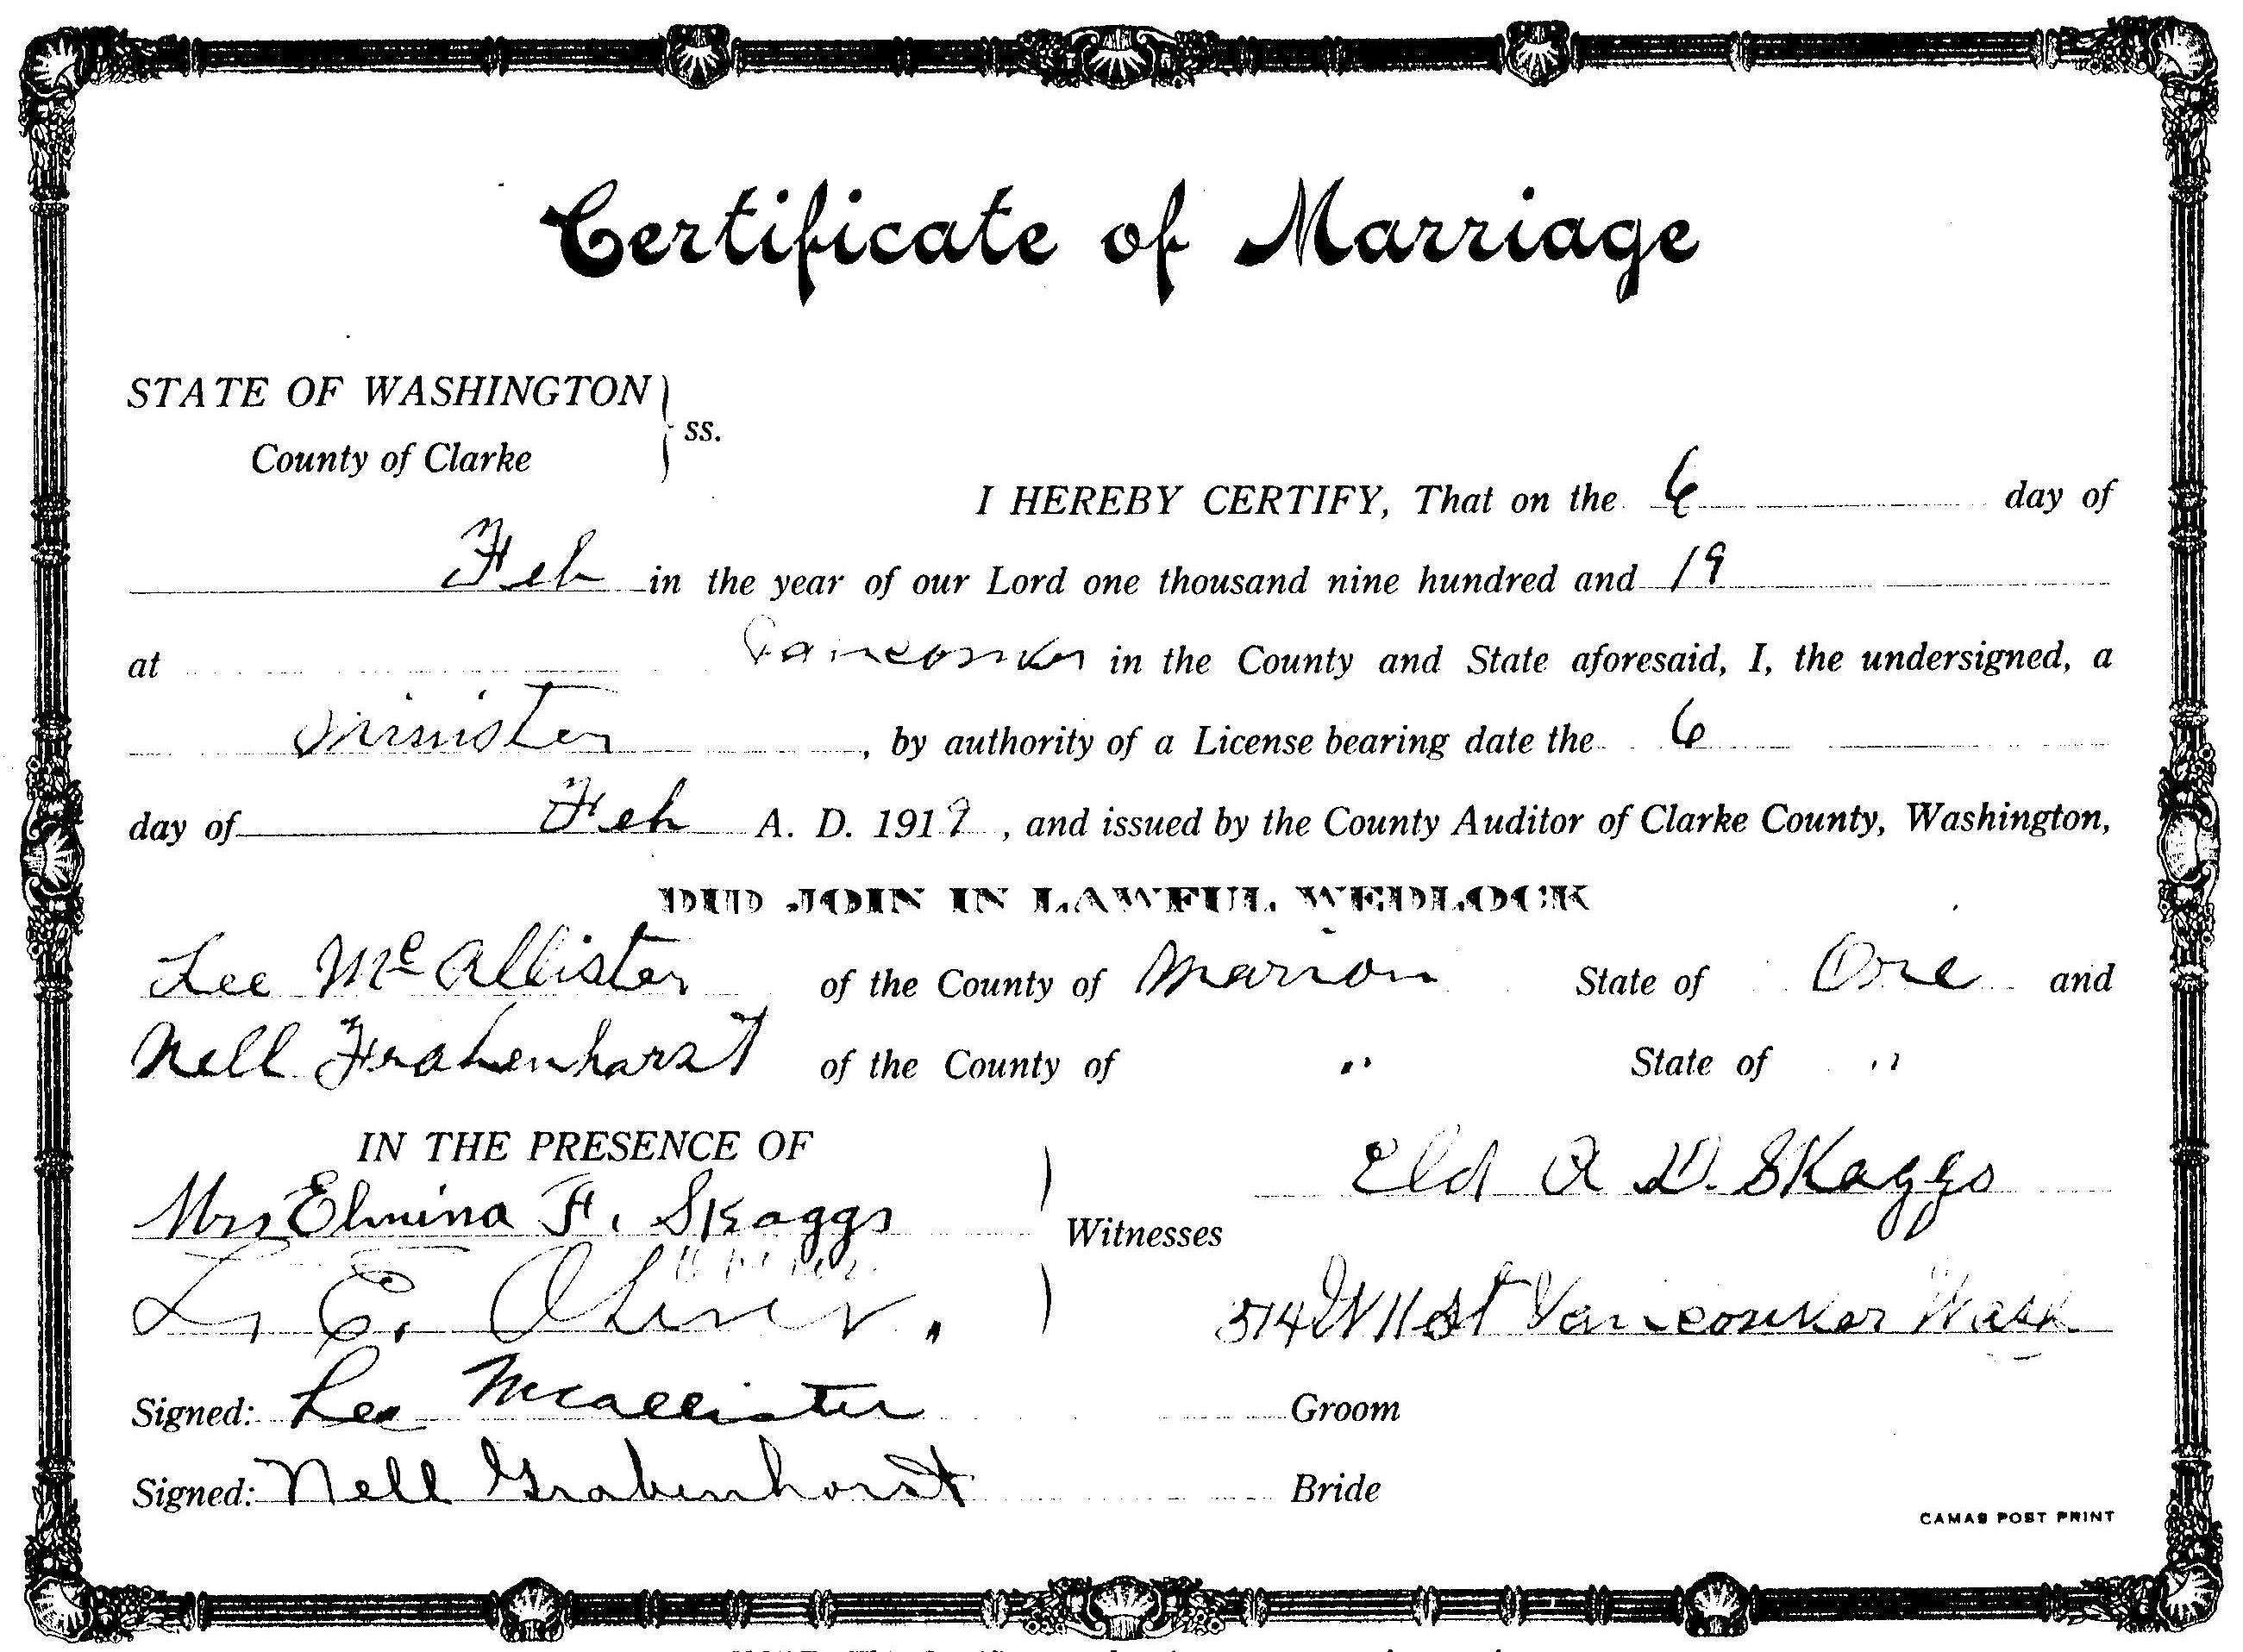 Descendents of henry george grabenhorst nell caroline grabenhorst oregon marriage certificate name nell grabenhorst name lee mcallister marriage date 6 feb1919 xflitez Image collections